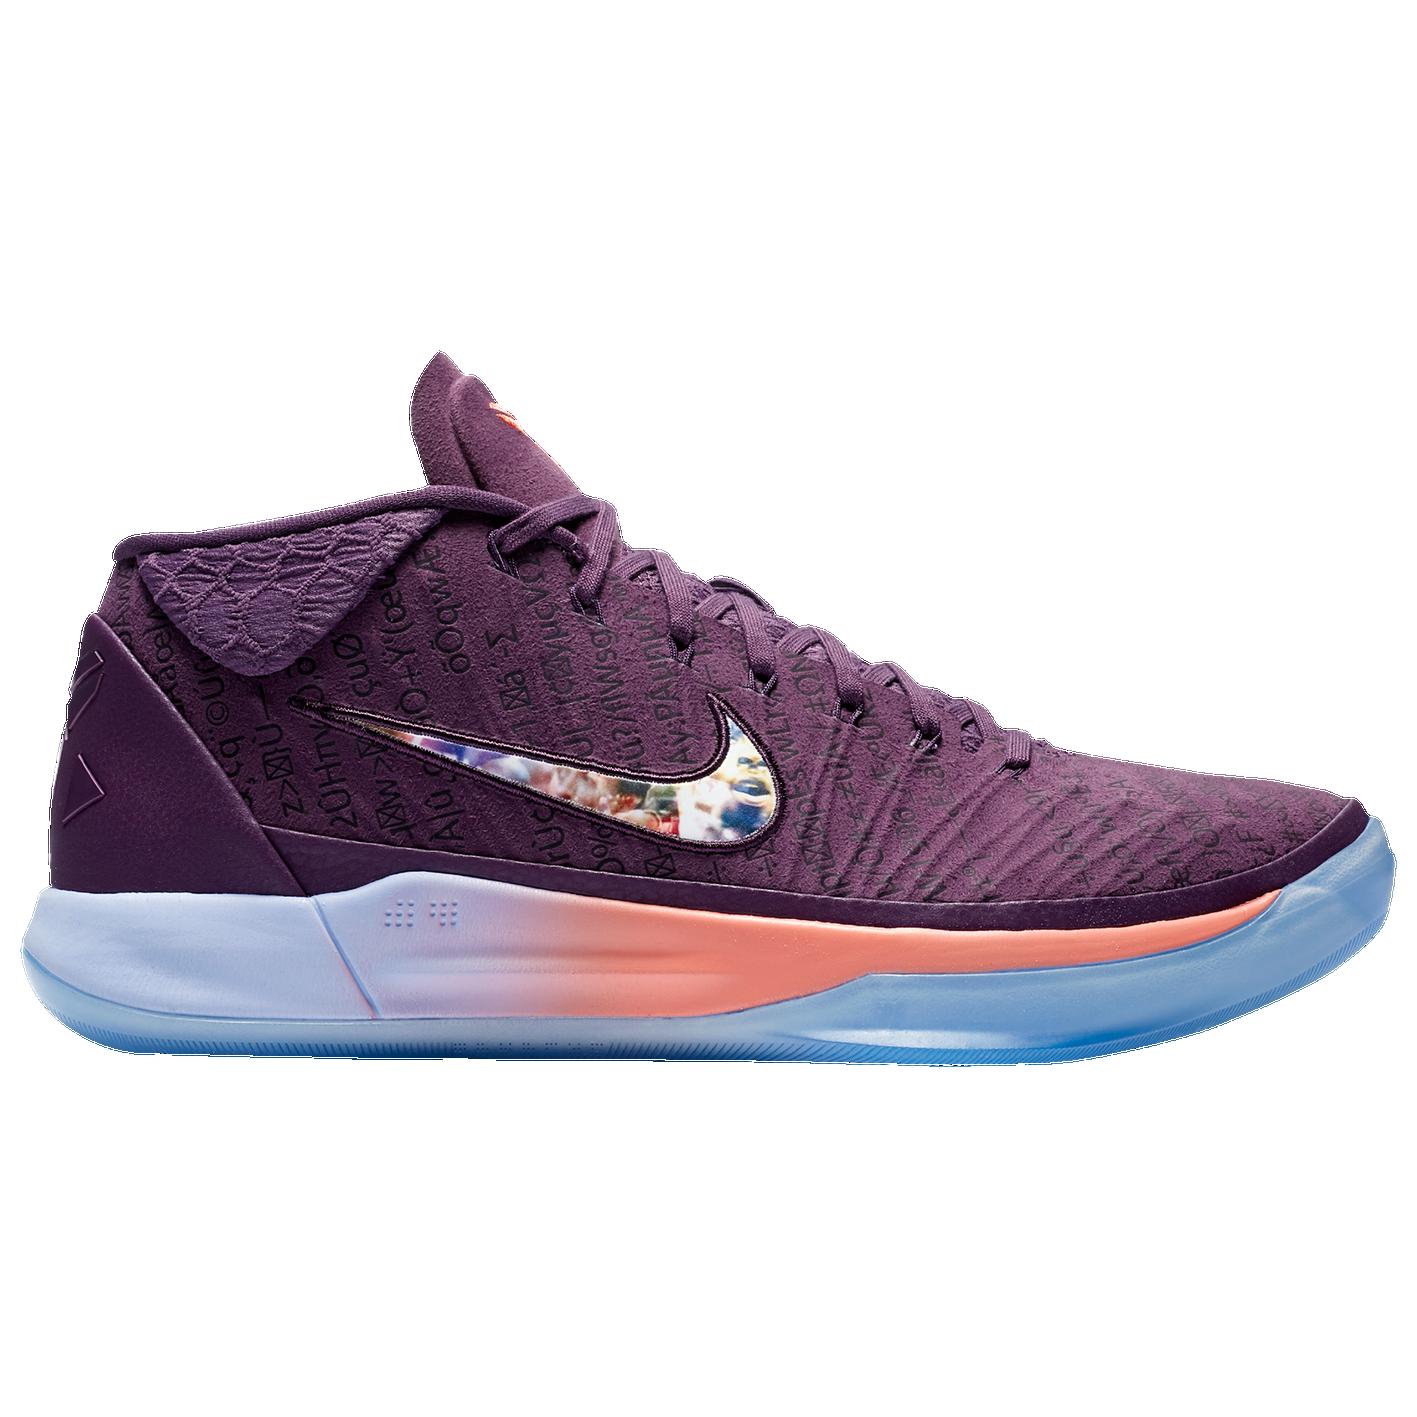 sale retailer 40213 d3a28 Nike Kobe A.D. - Mens